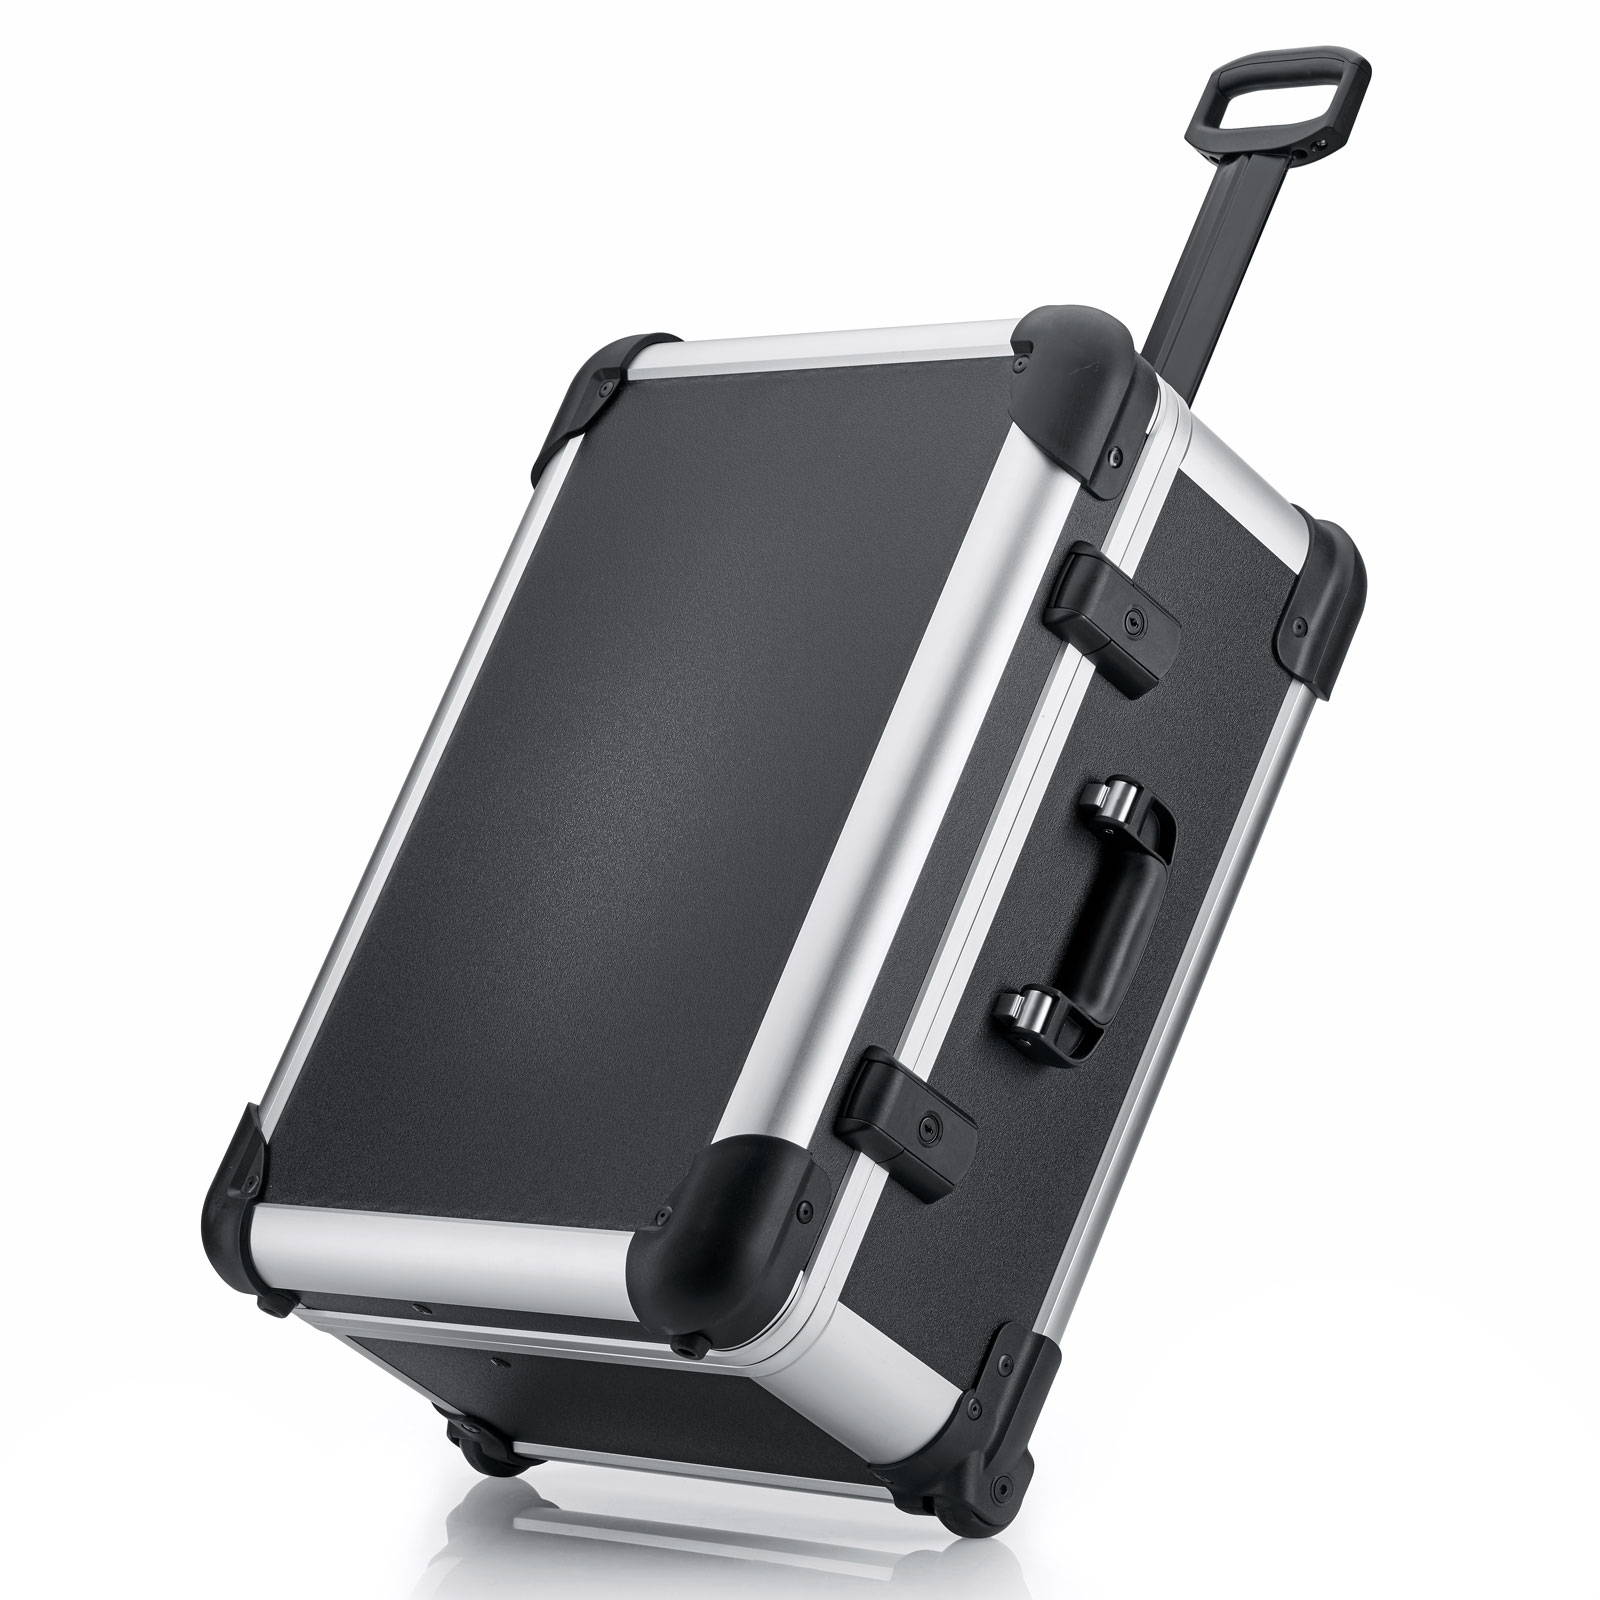 bwh Koffer  Robust Case Transportkoffer Typ 4 mit  Transportkoffer  2 Rollen